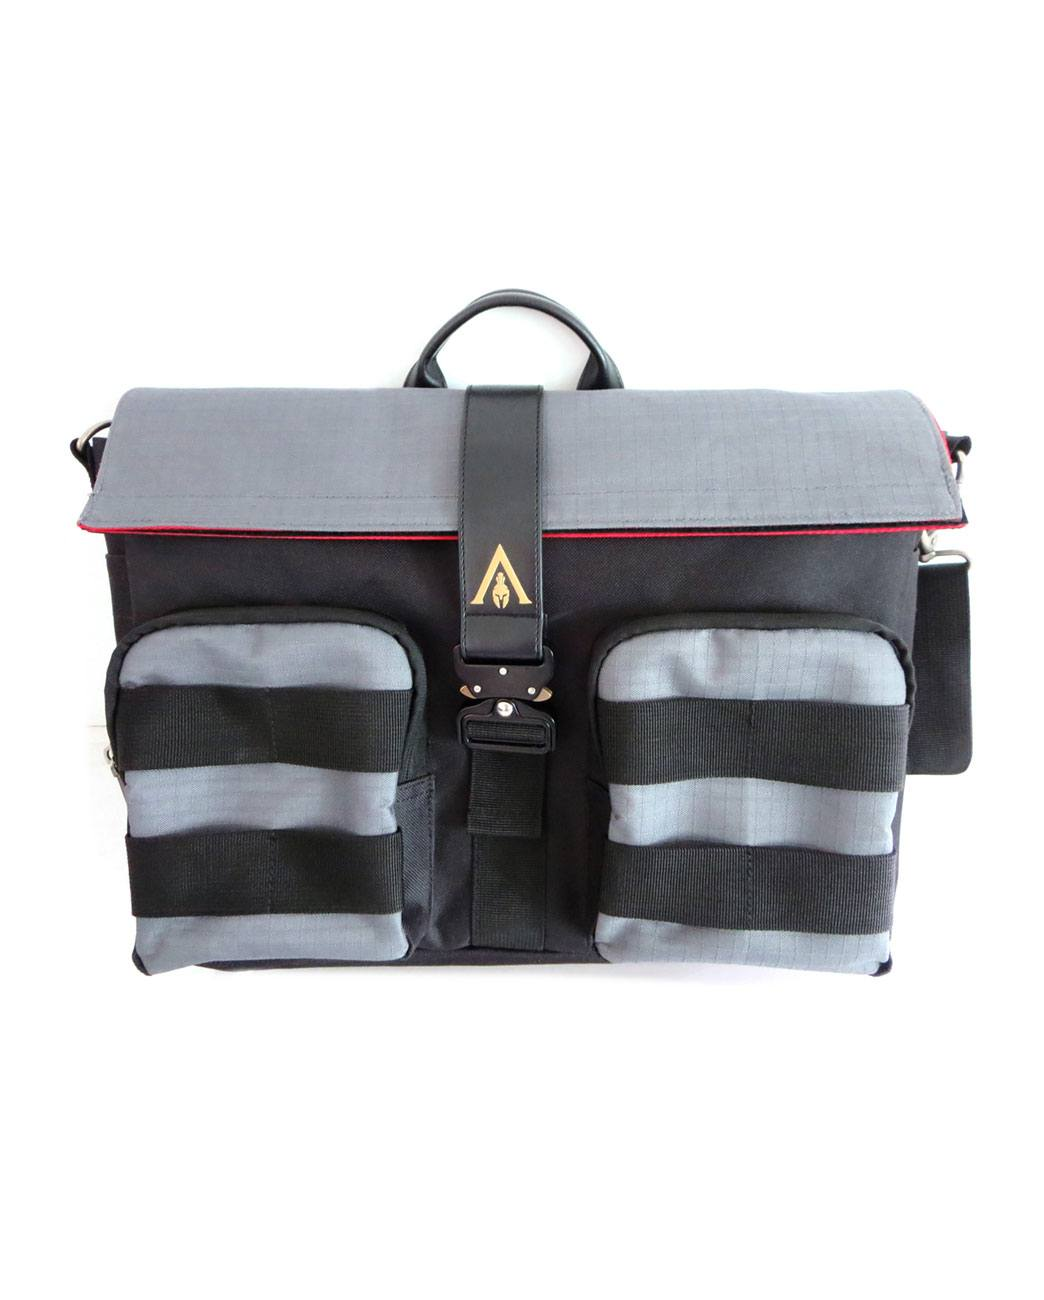 Assassin's Creed Odyssey Messenger Bag Washed